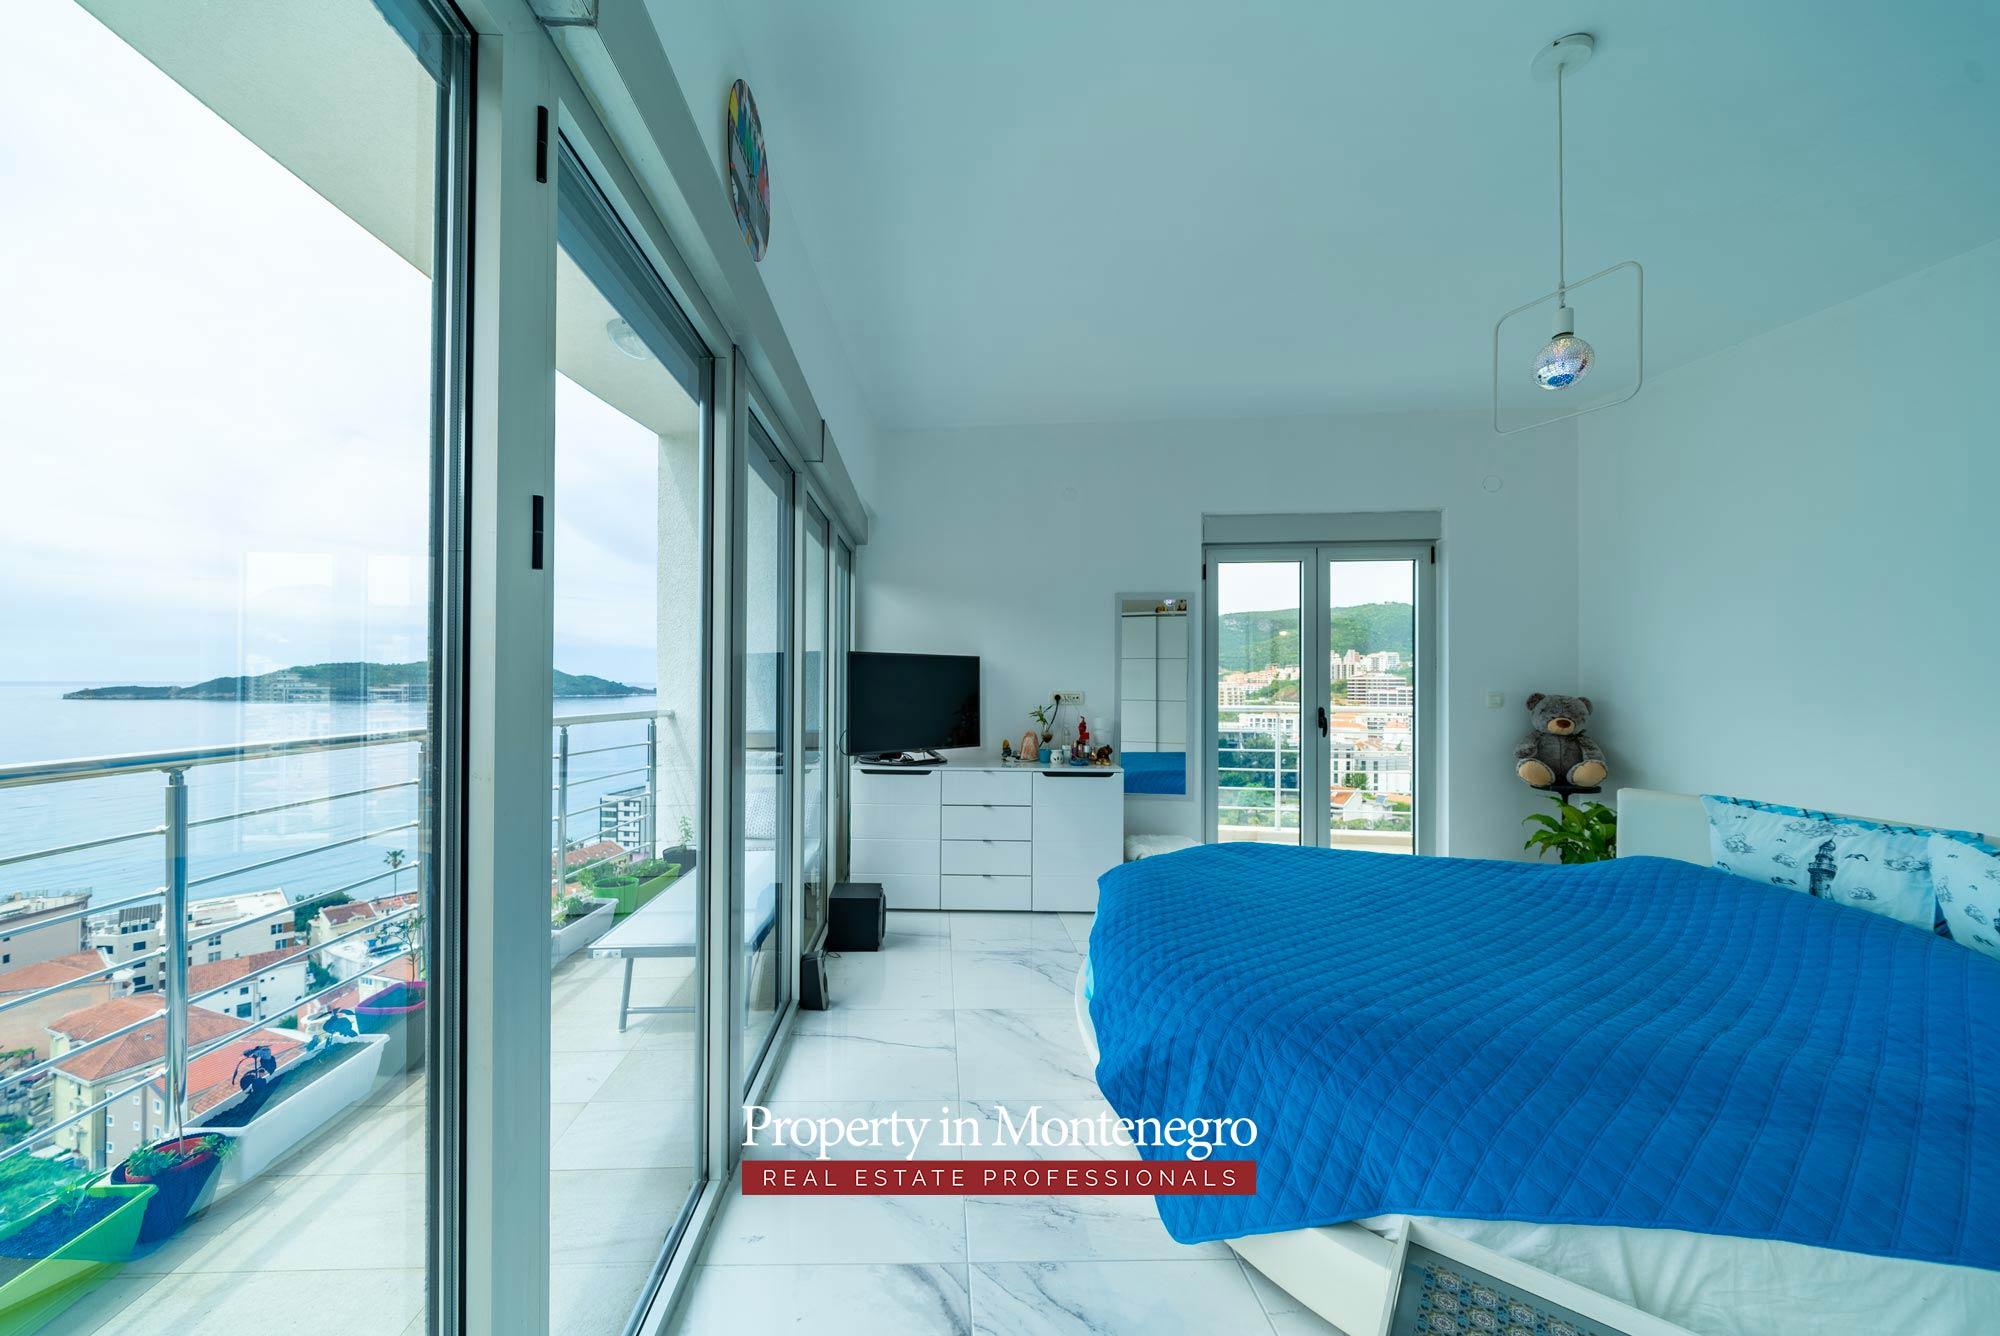 Two bedroom apartment for sale in Rafailovici